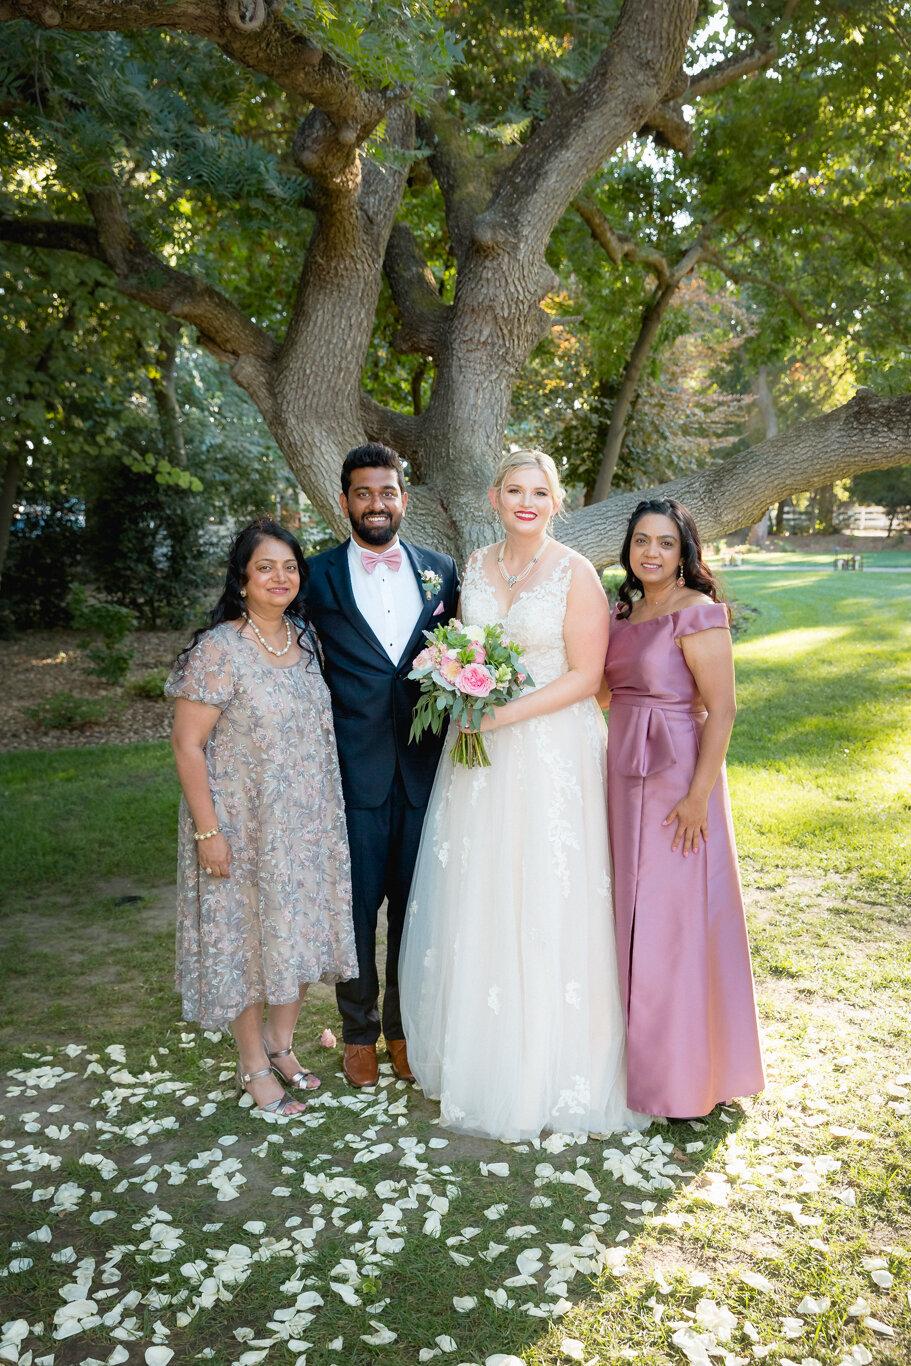 2019.08.24_Emily-Ashir-Wedding-at-the-Maples-6088.jpg